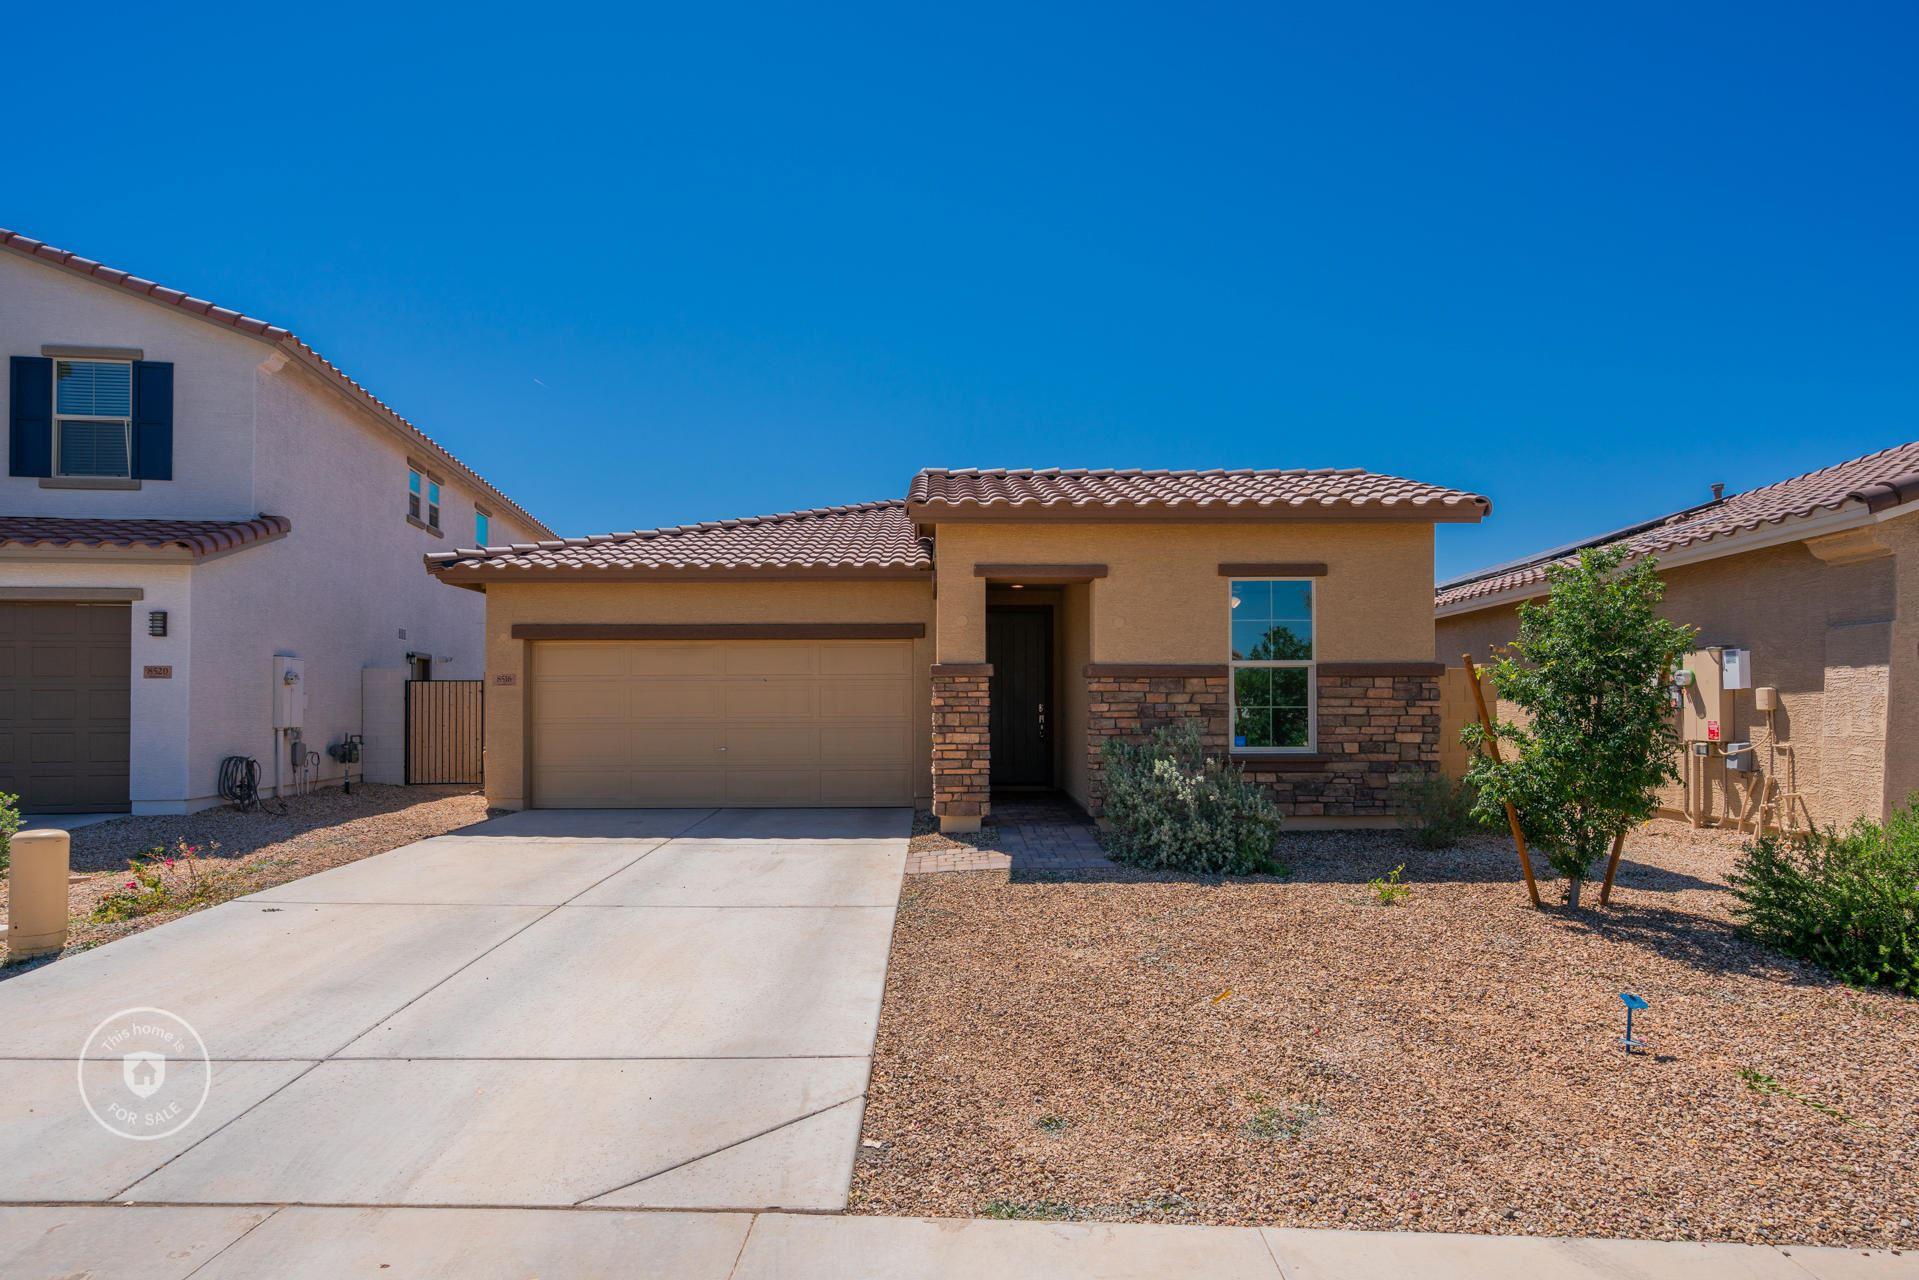 Photo of 8516 S 40TH Glen, Laveen, AZ 85339 (MLS # 6229404)